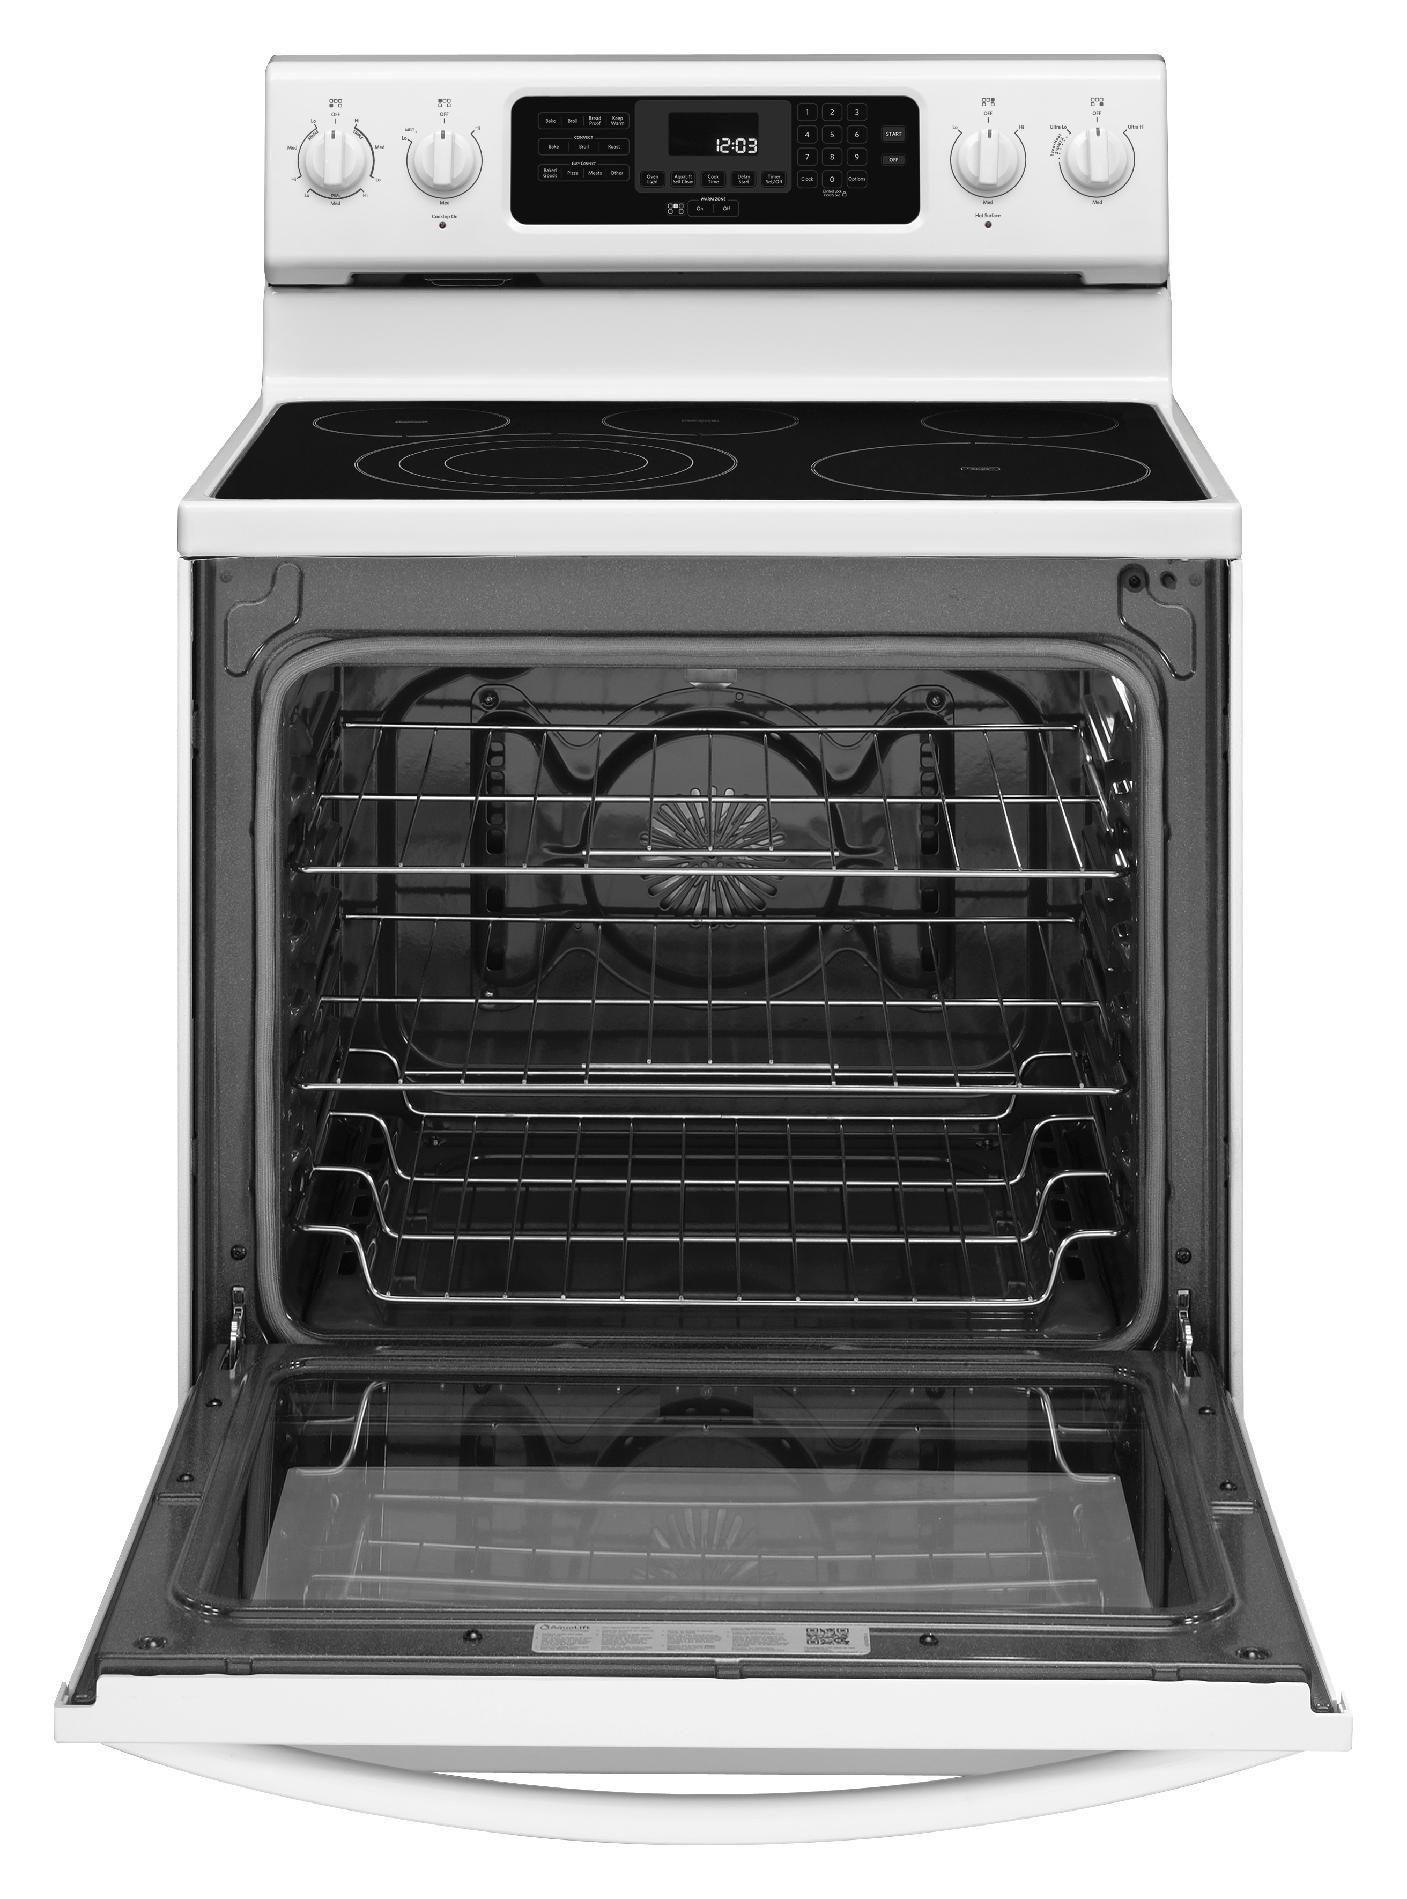 KitchenAid 6.2 cu. ft. Electric Range w/ Even-Heat™ Technology - White